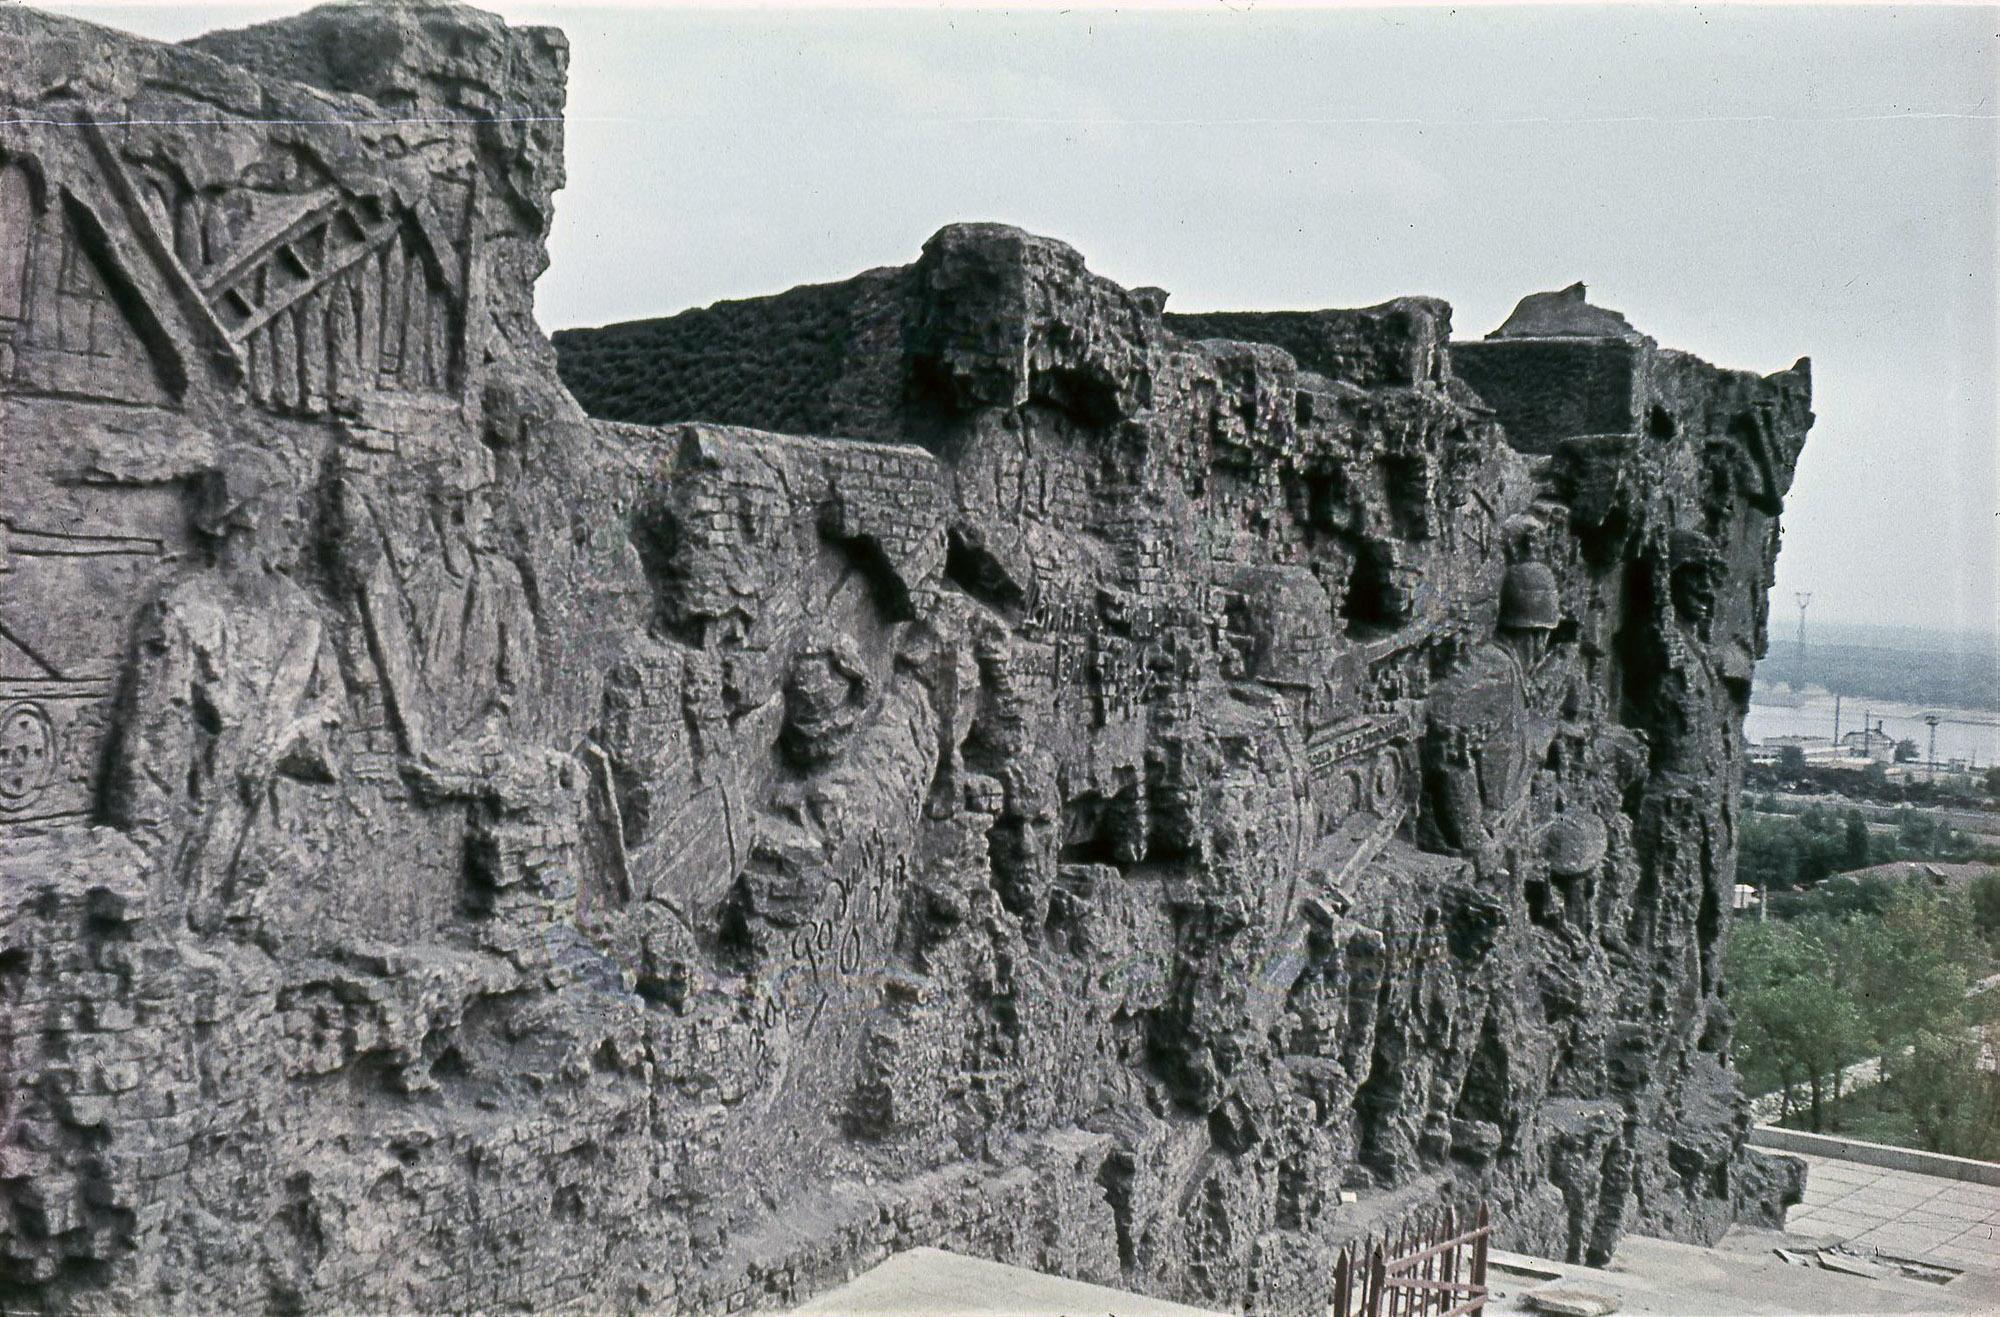 Волгоград. «Мамаев курган». Стена-руина